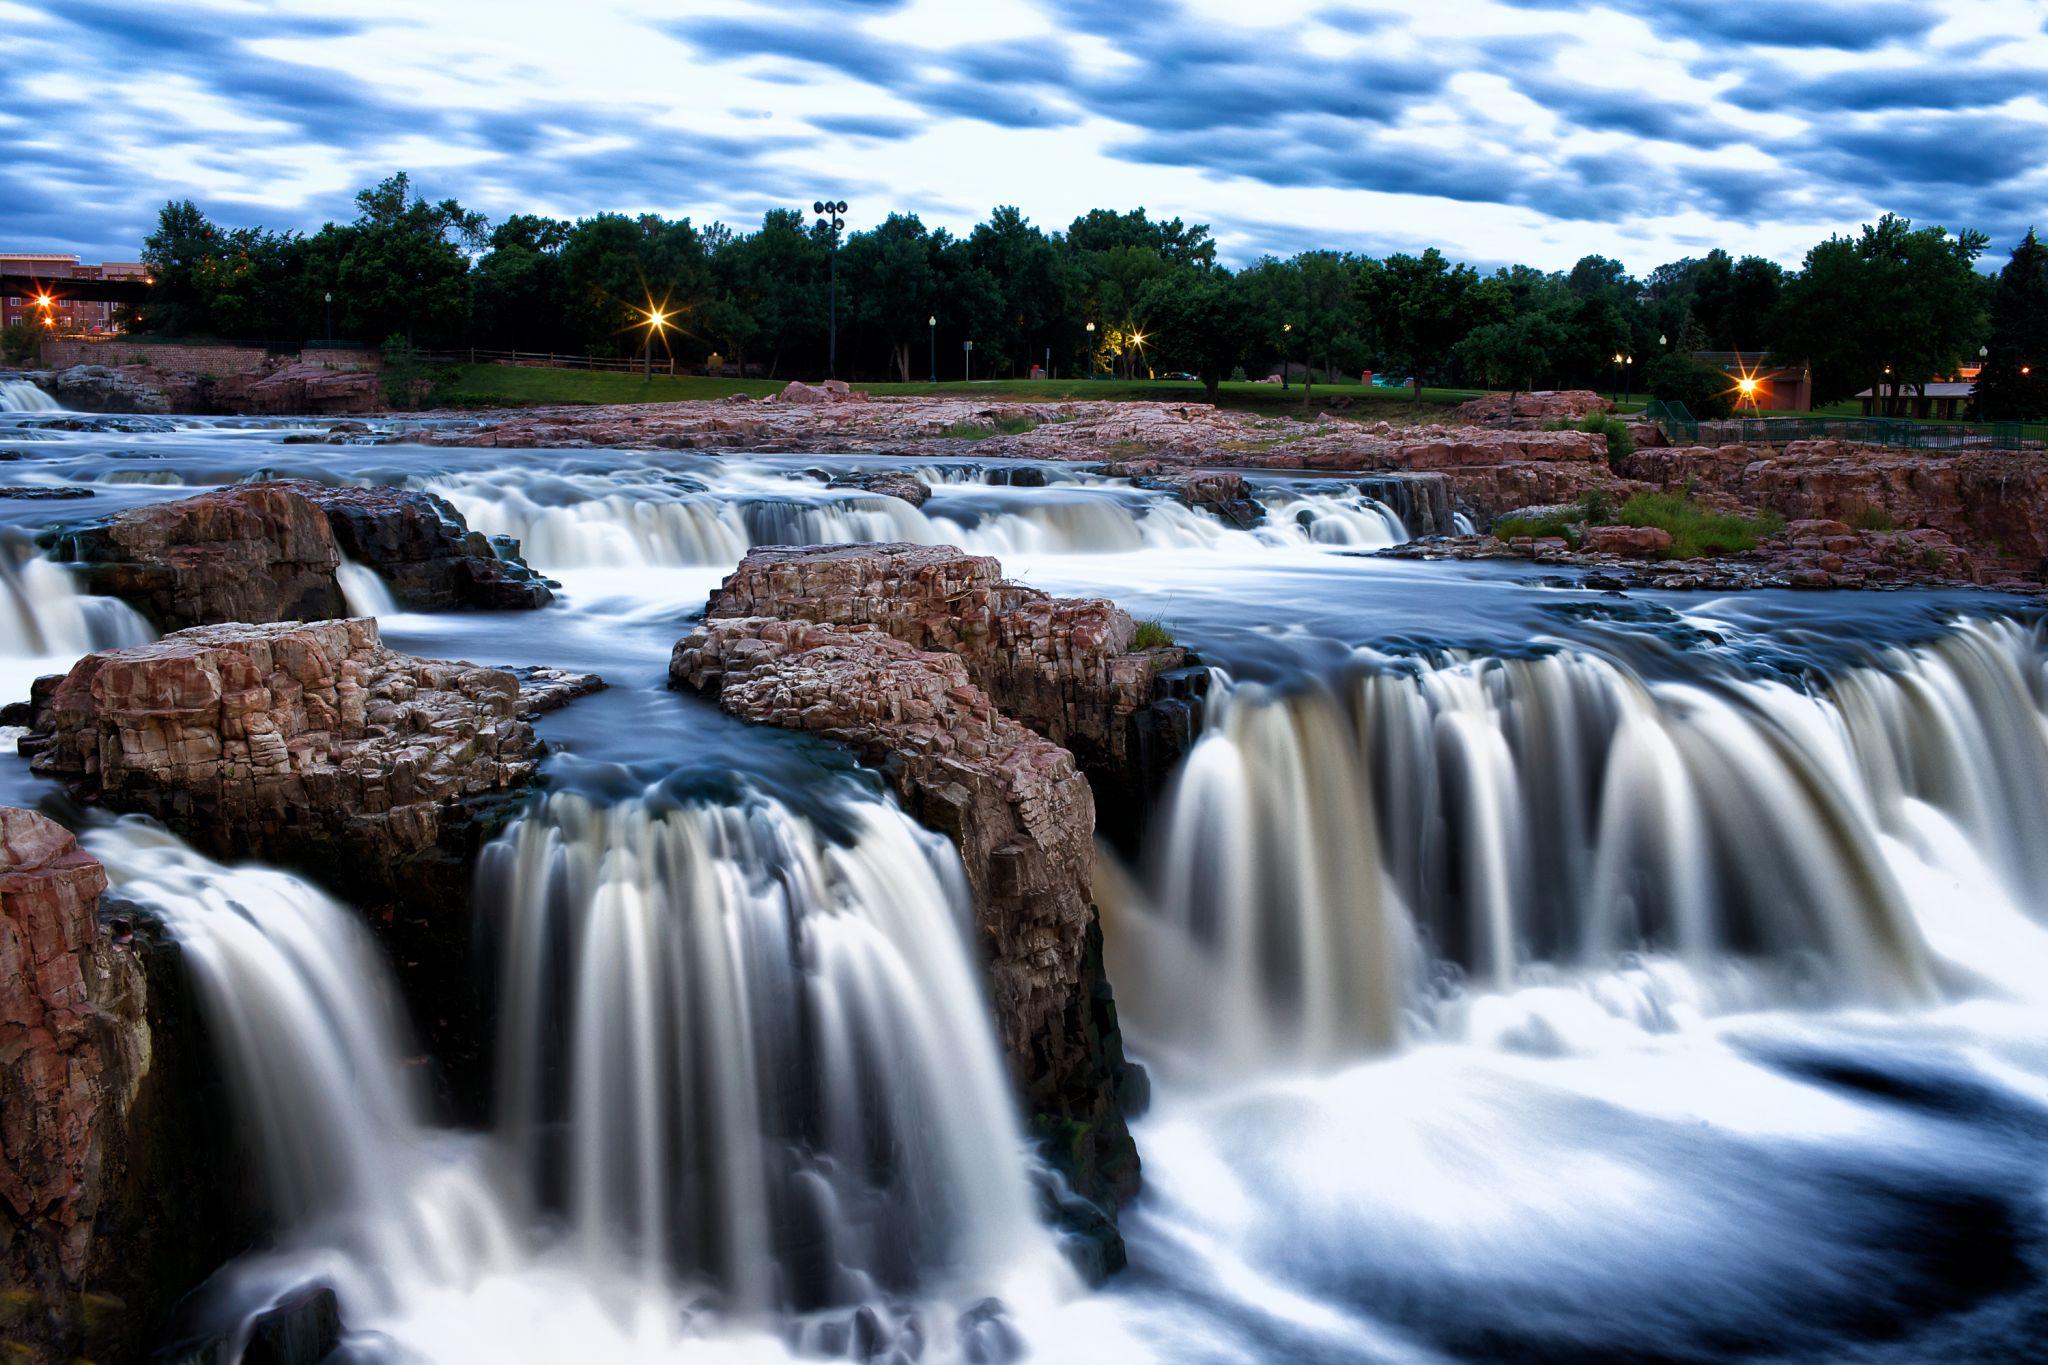 Falls Park, Sioux Falls, South Dakota, USA